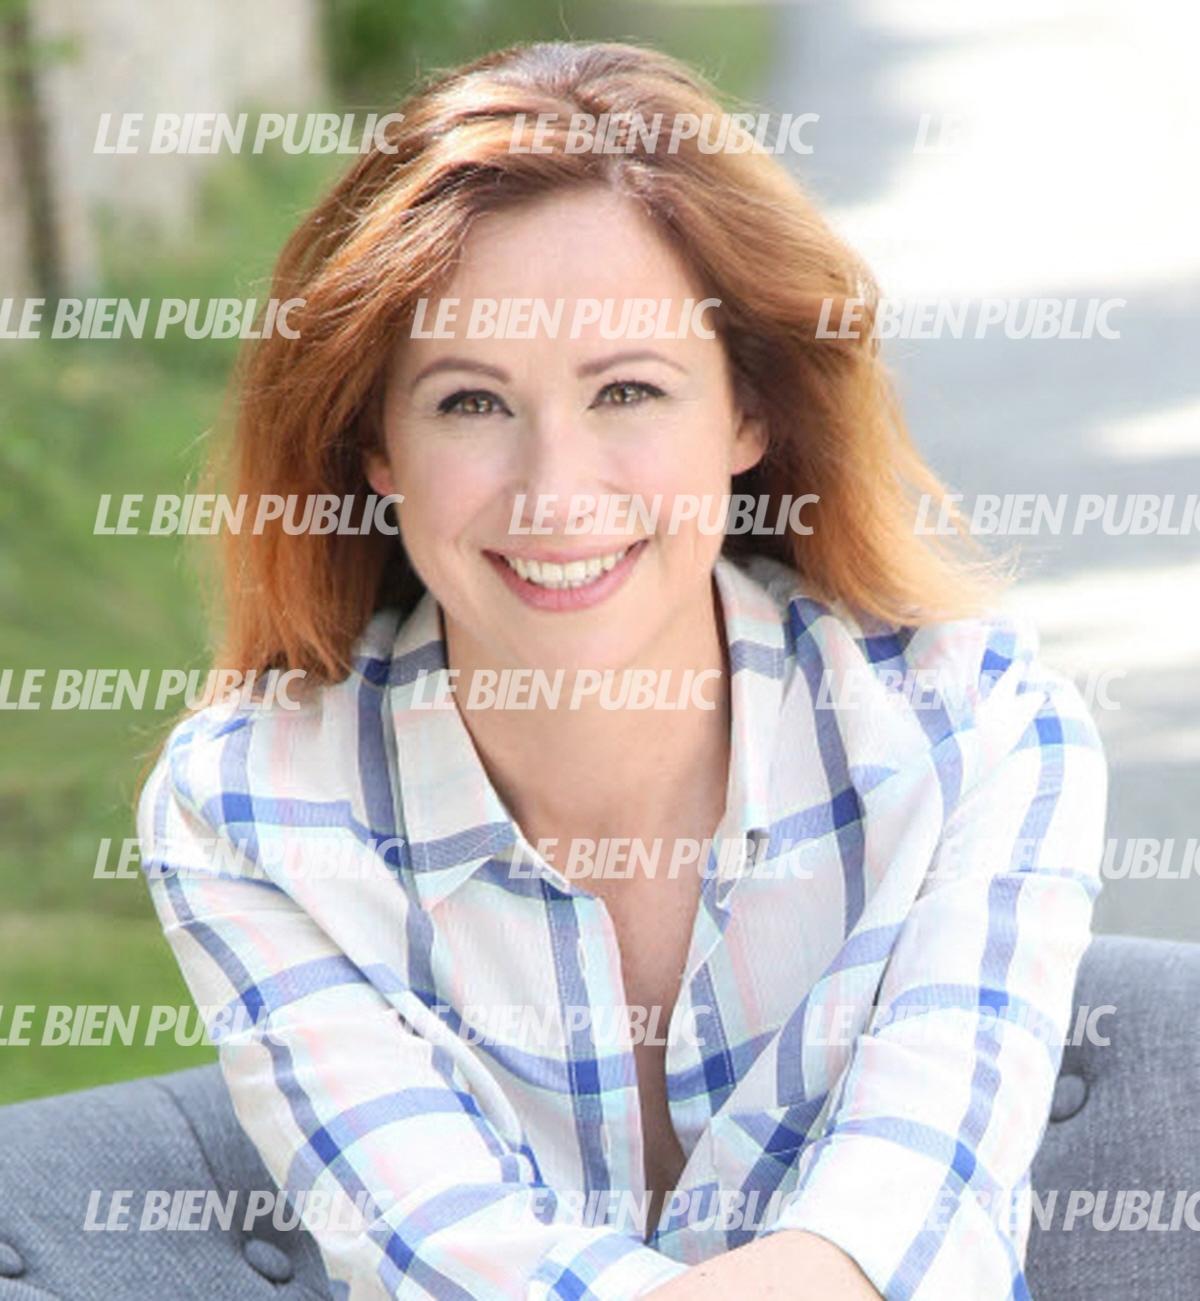 Sophie Davant Compagnon Georges Menut 2016 Beau Photos sophie Ferjani son Mari at Master Github Arthur Sadoun Alchetron